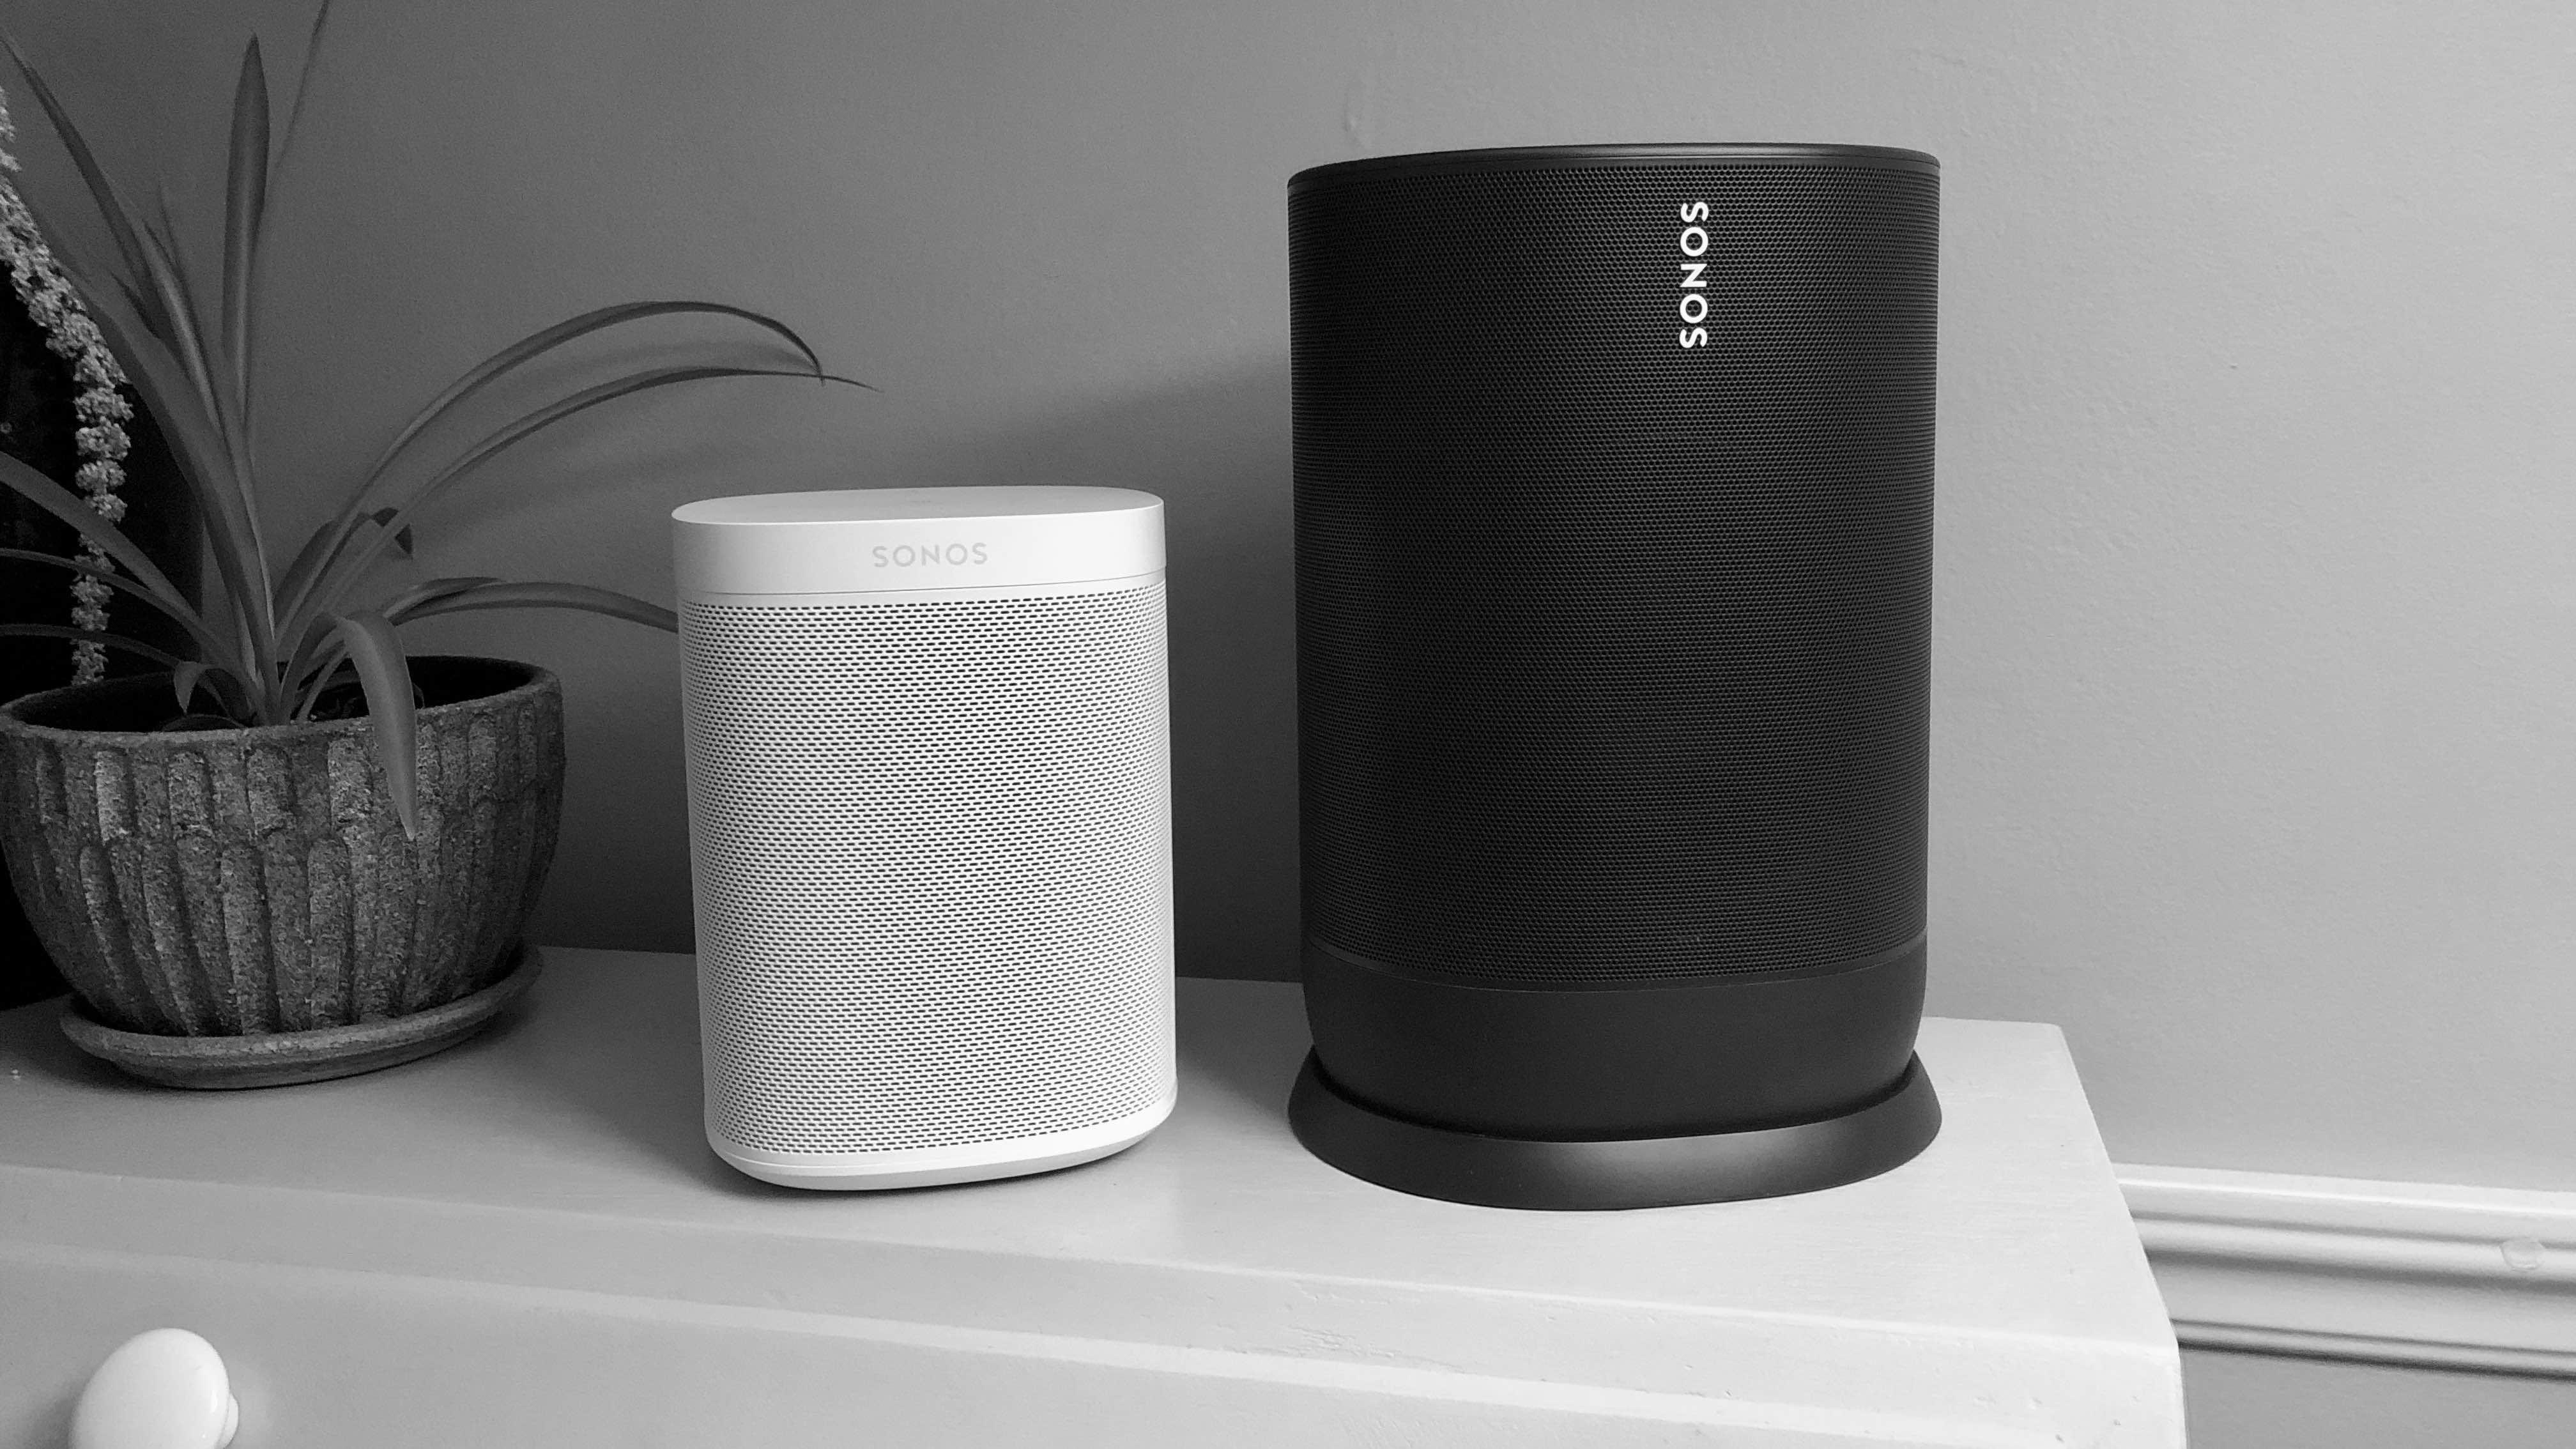 Sonos Move and Sonos One comparison